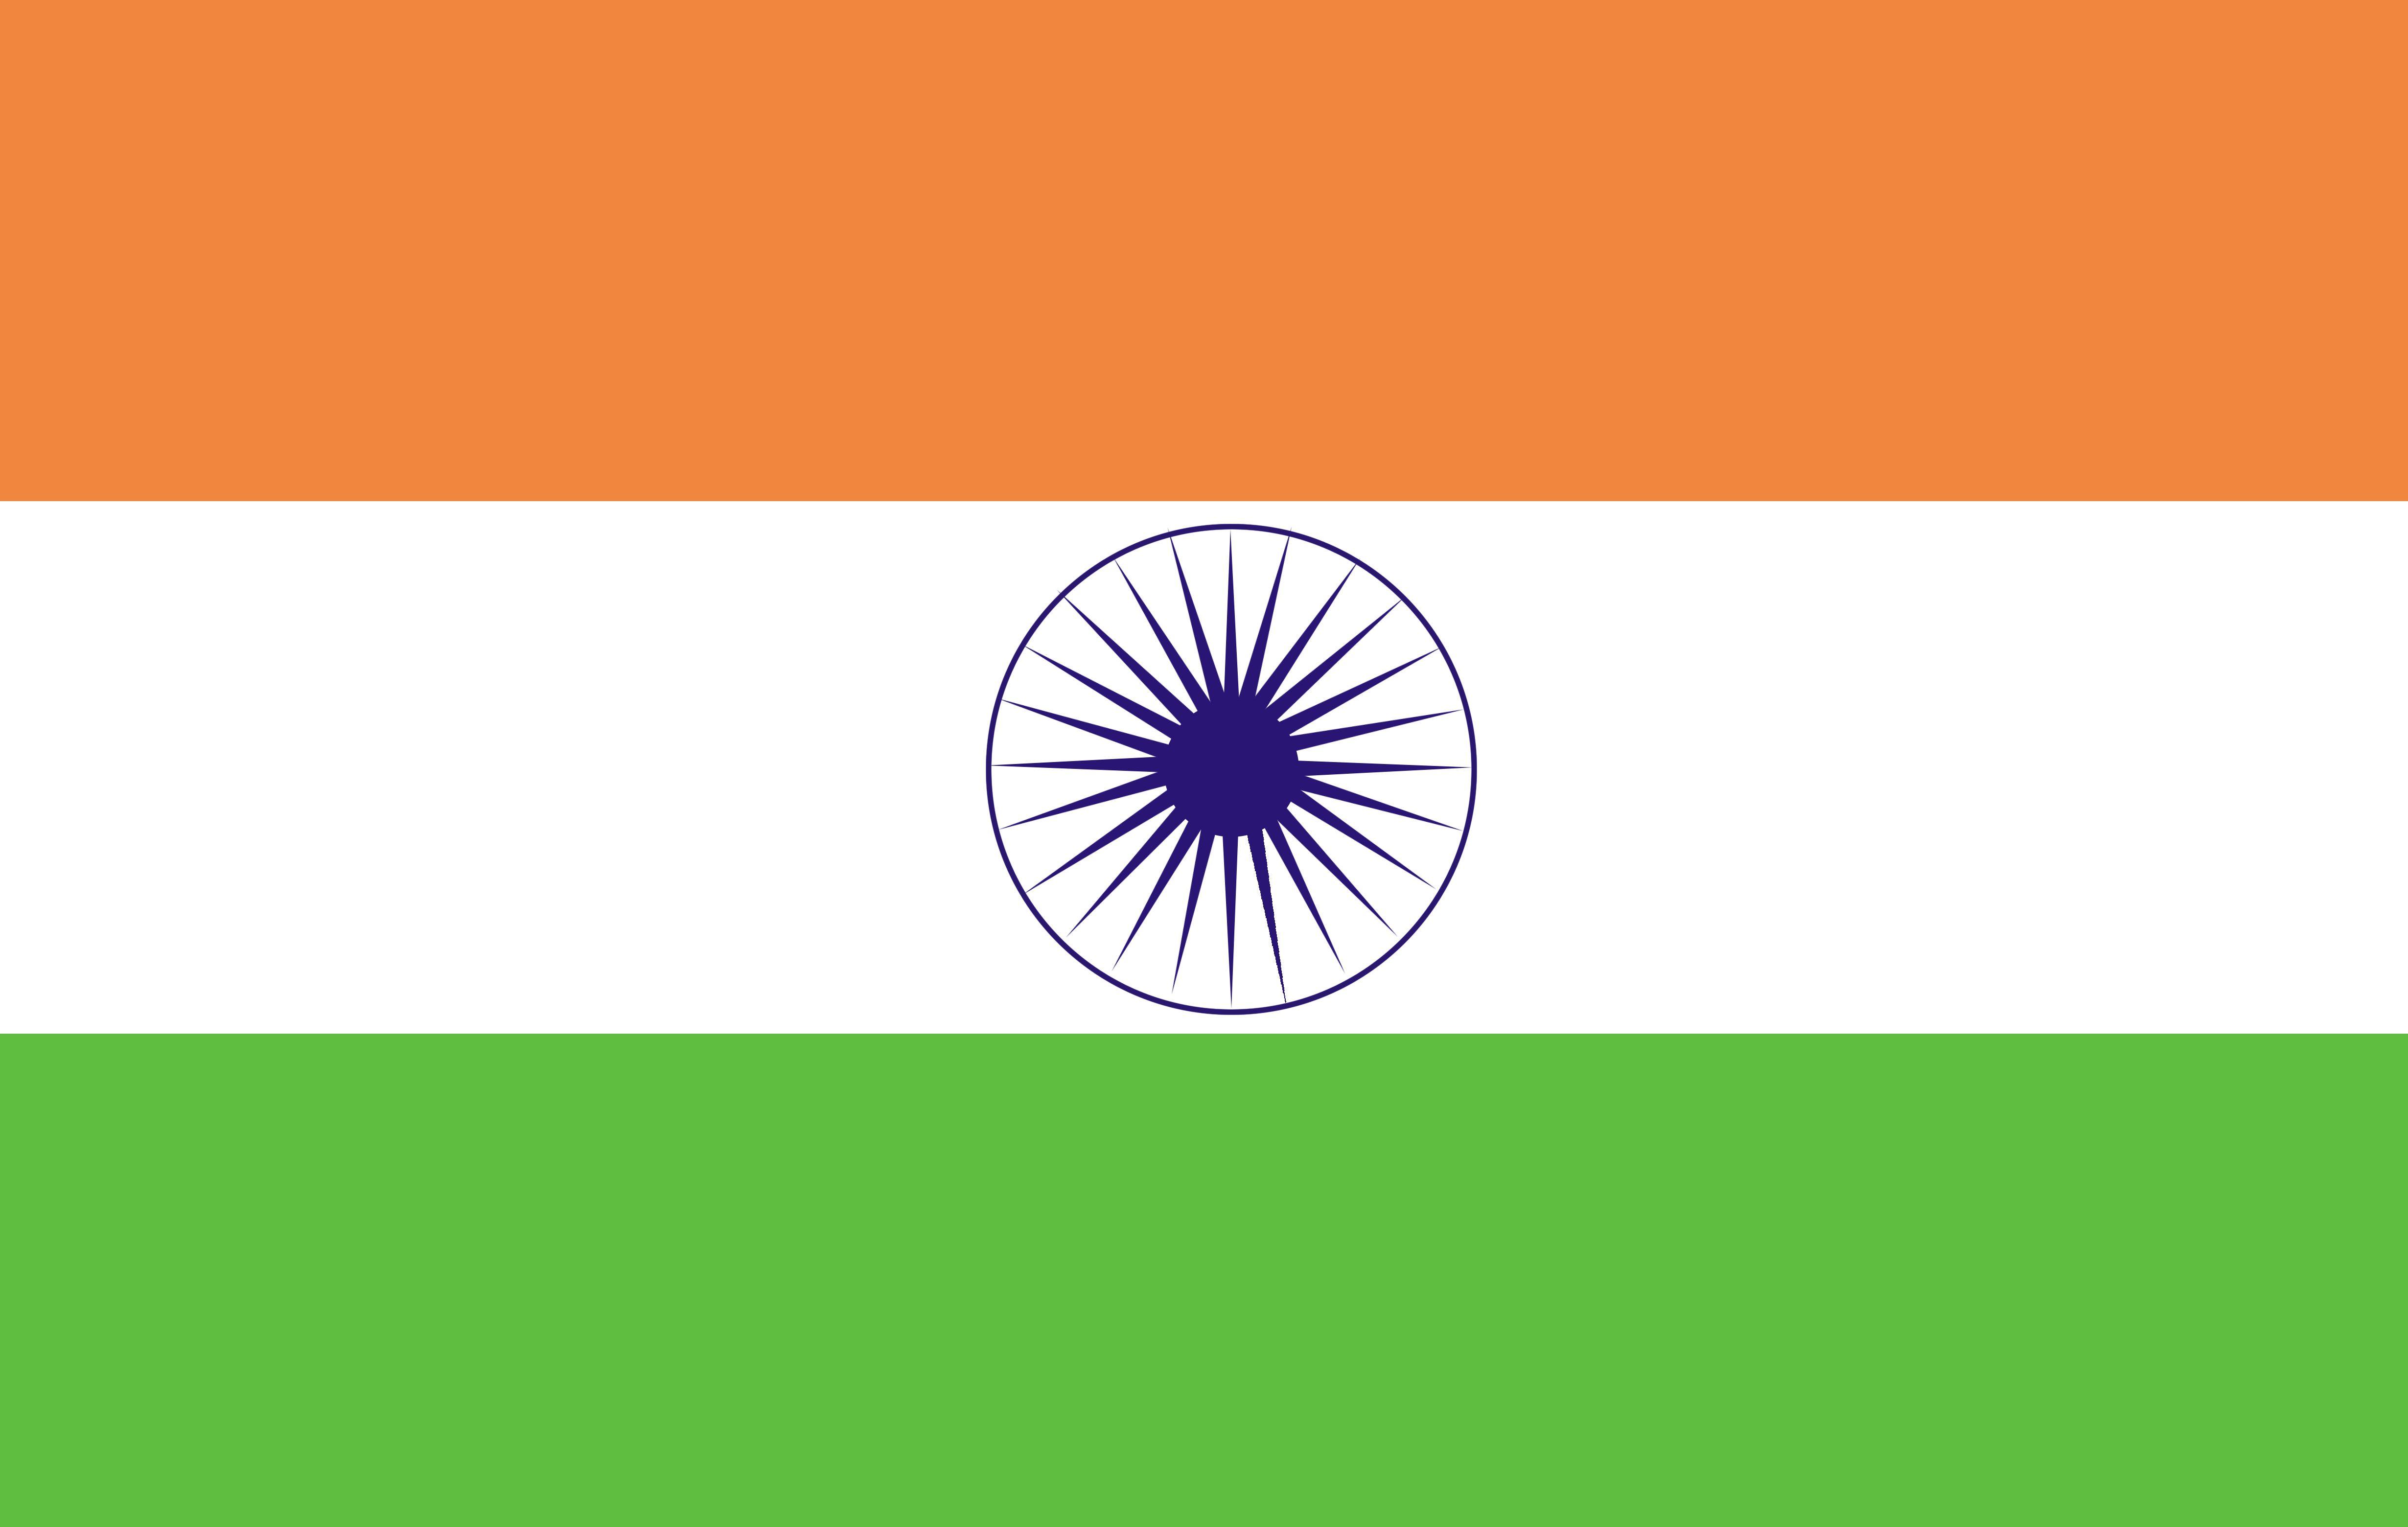 flag indian india hd wallpapers national independence 4k flags symbols proud earth desktop granite happywalagift hindi fla symbol religious dictatorships